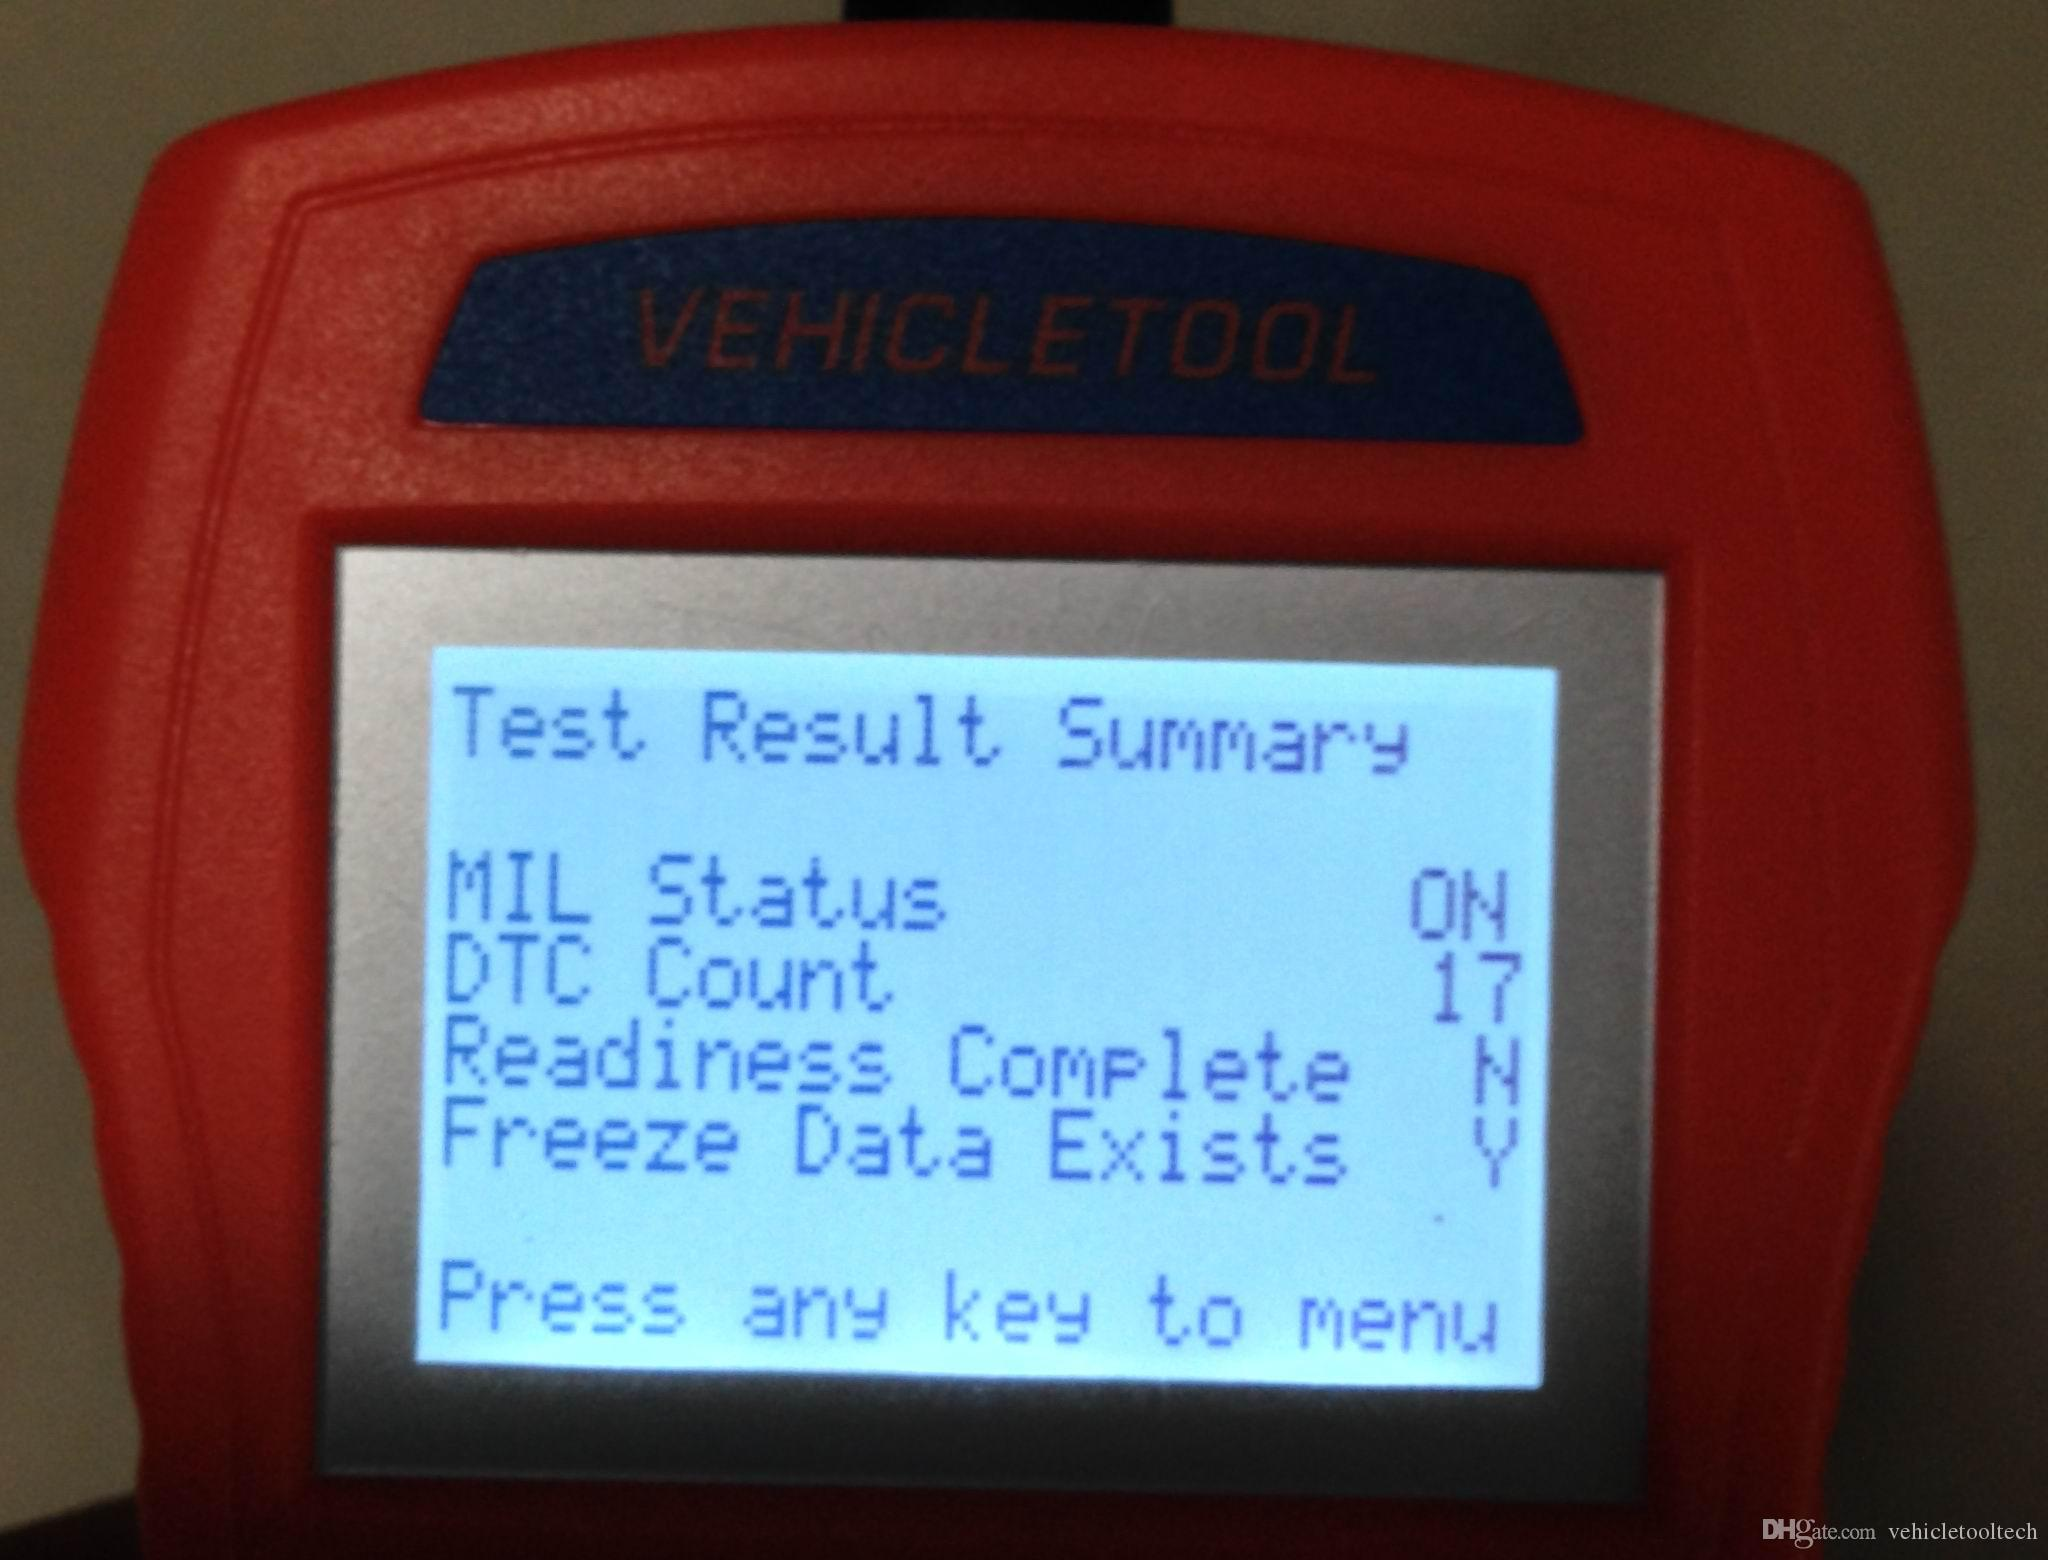 OBD2 mini Automotive Diagnostic OBD EOBD Scanner For EU US Aisian Vehicles multi-language CAN OBDII/EOBD Code Reader